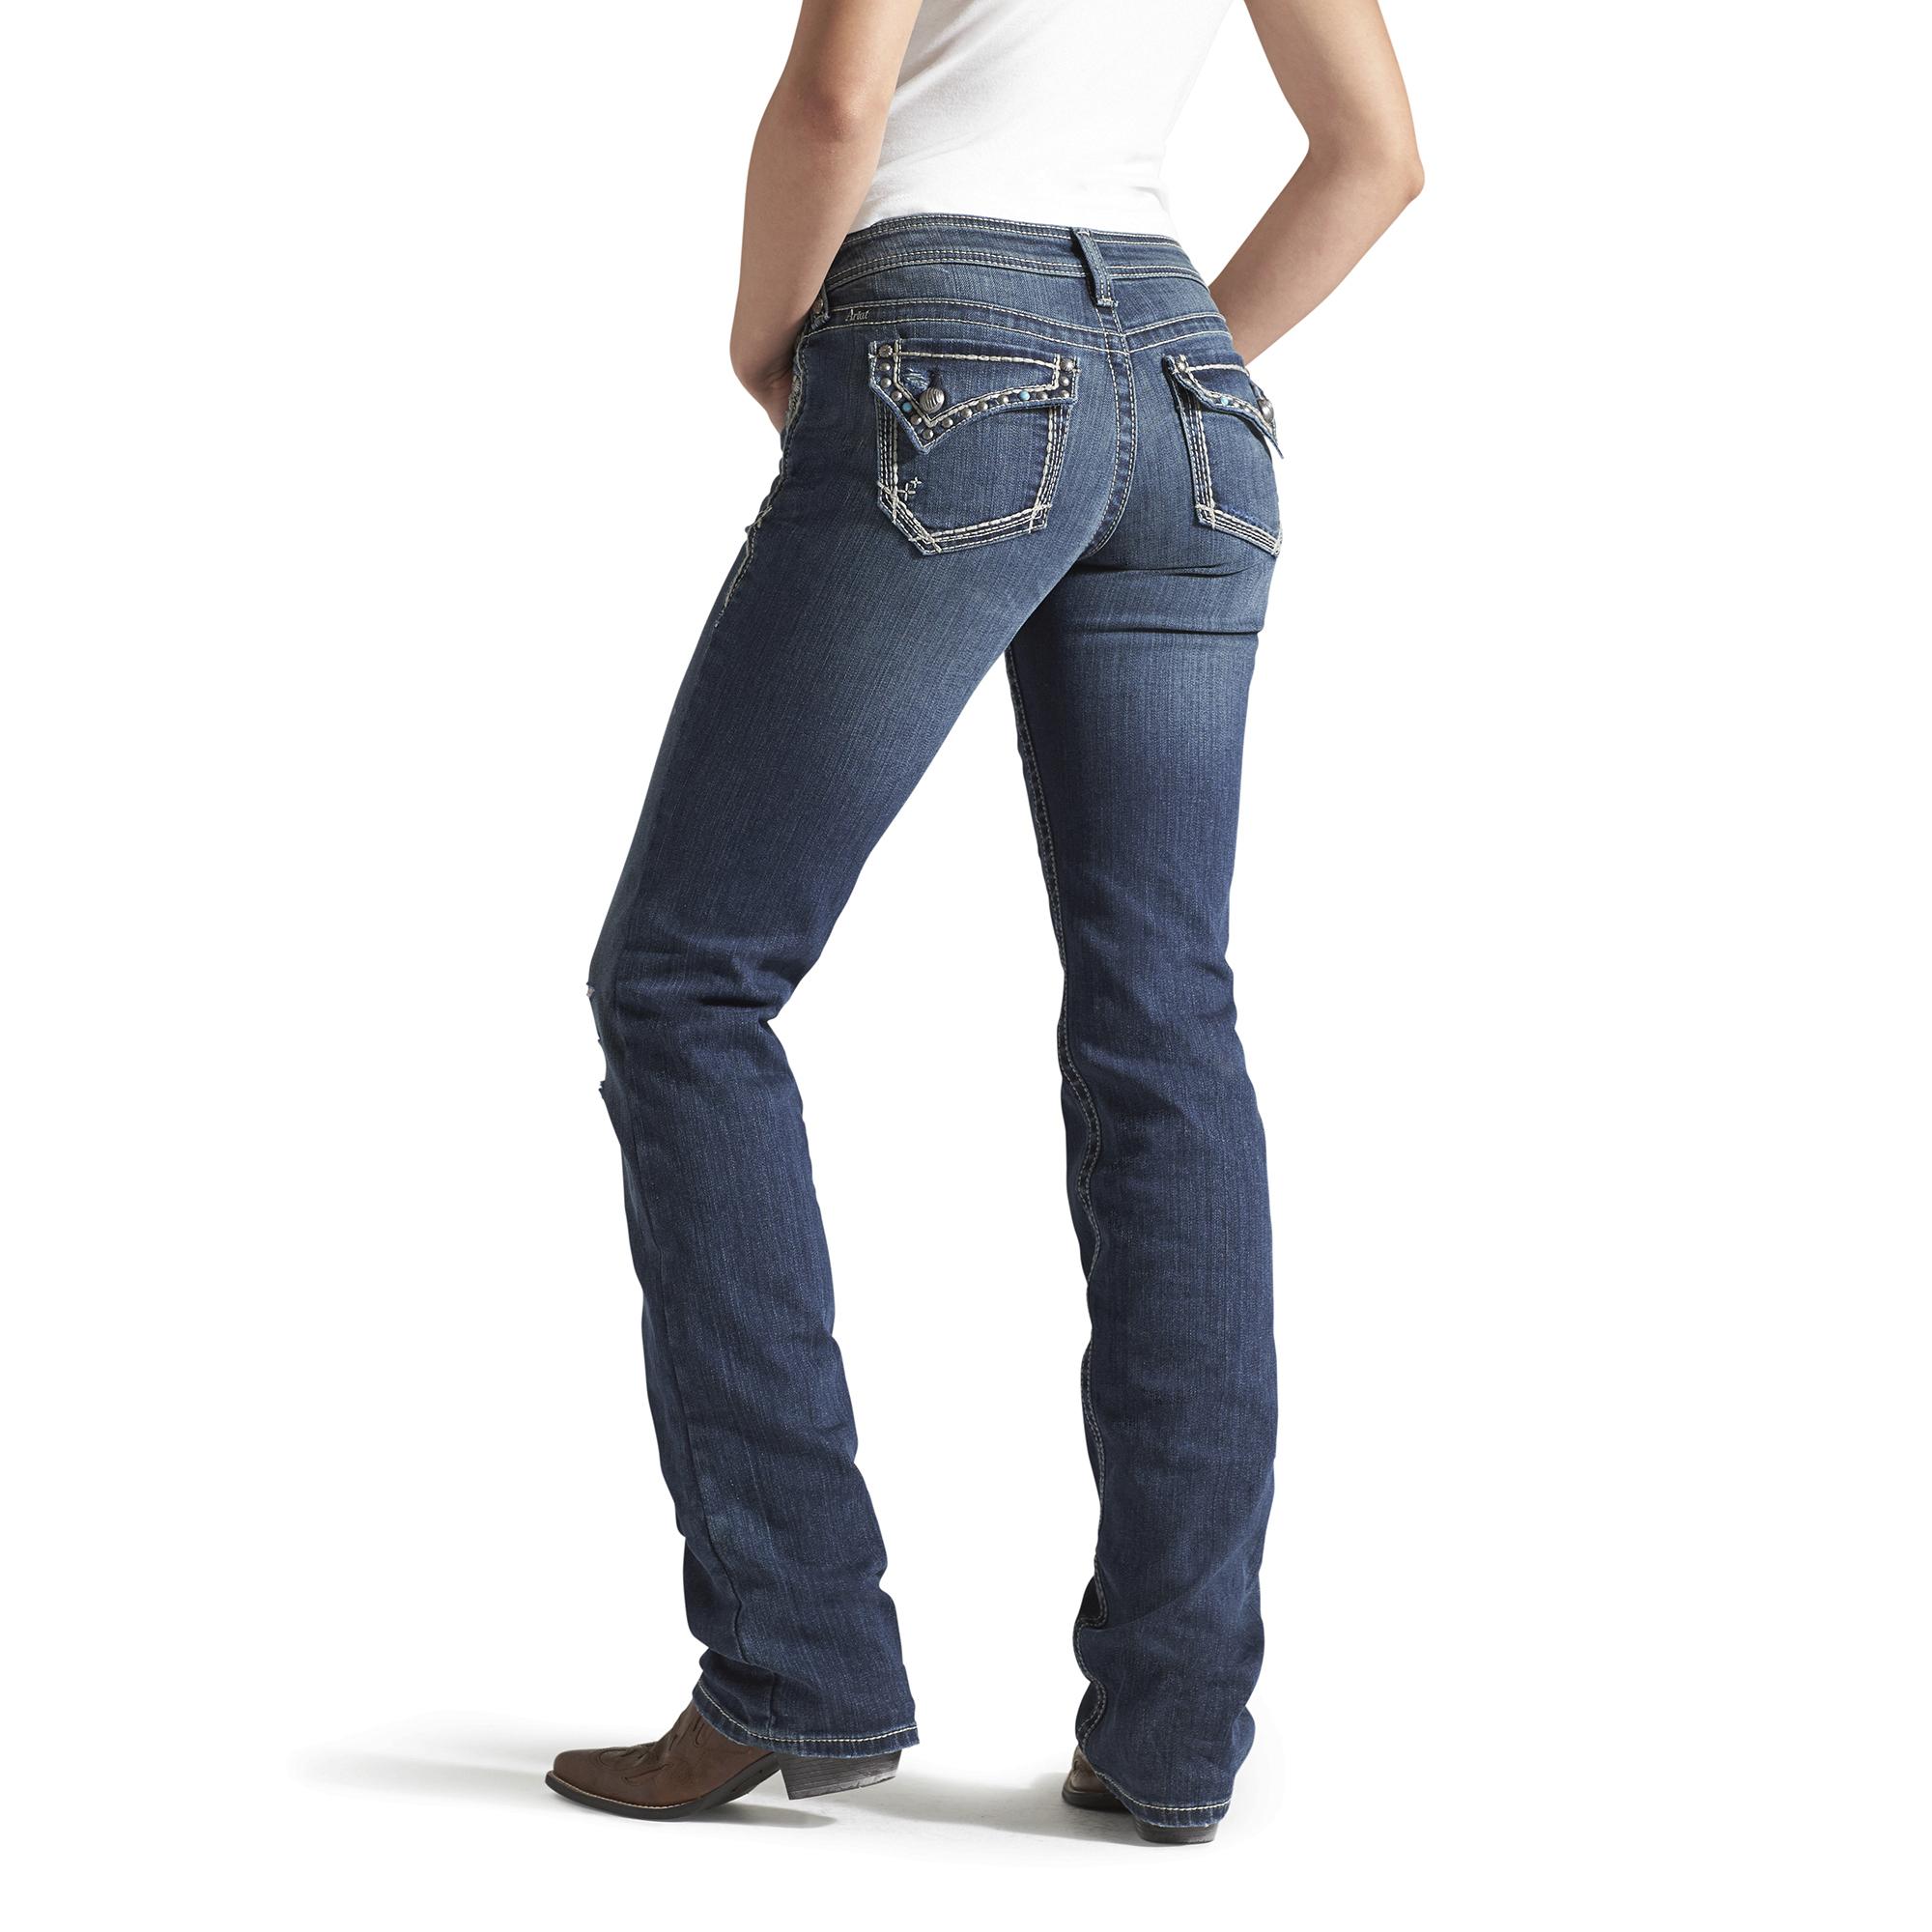 Ariat Women's Amber Silversmith Jean